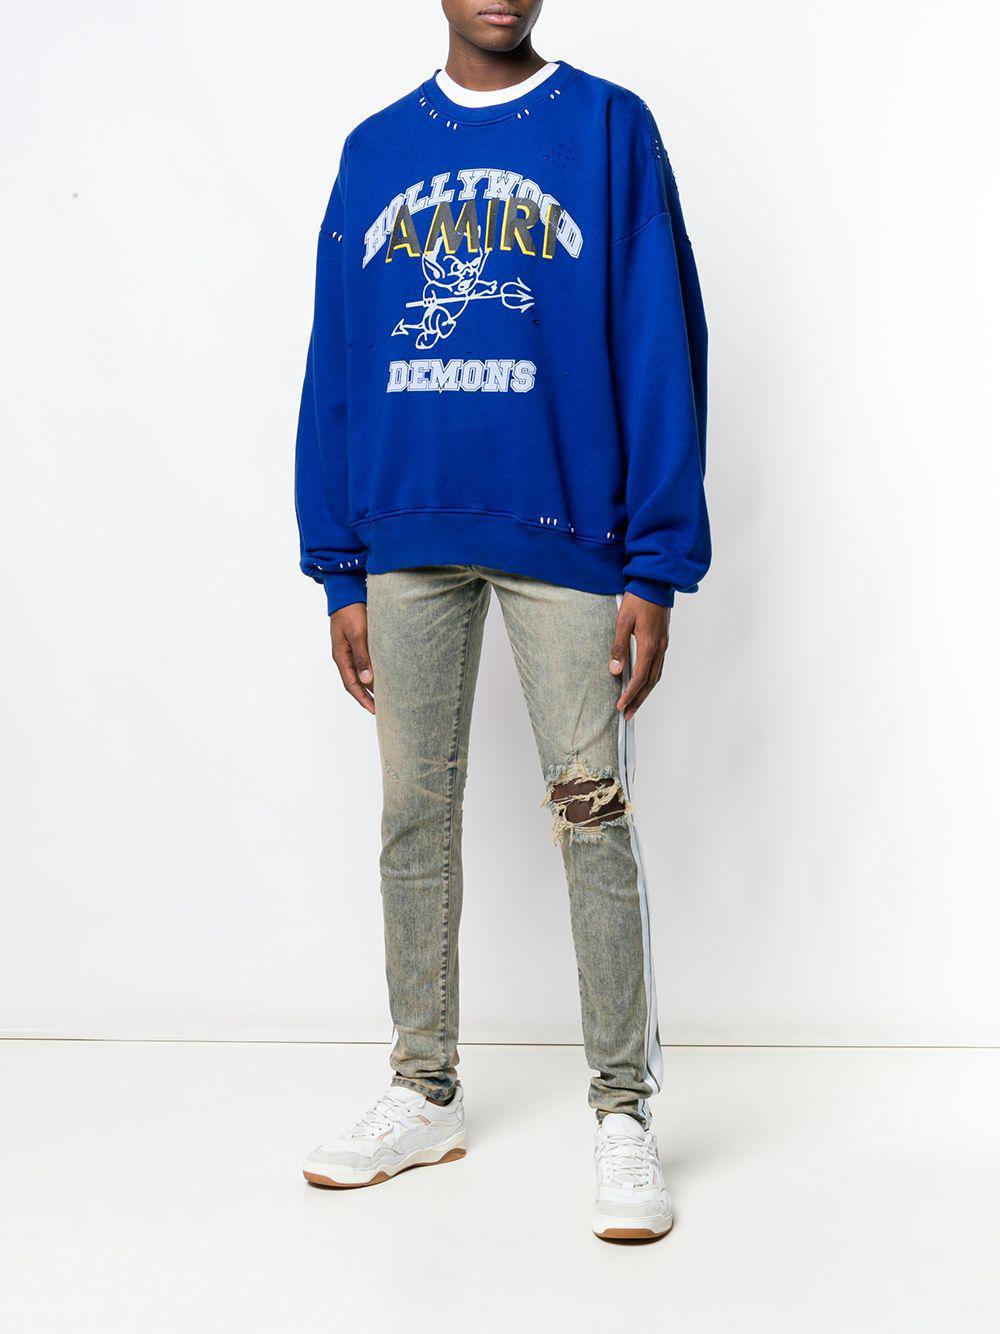 68cfb3f1d22 Lyst - Amiri White Stripe Skinny Jeans in Blue for Men - Save 15%